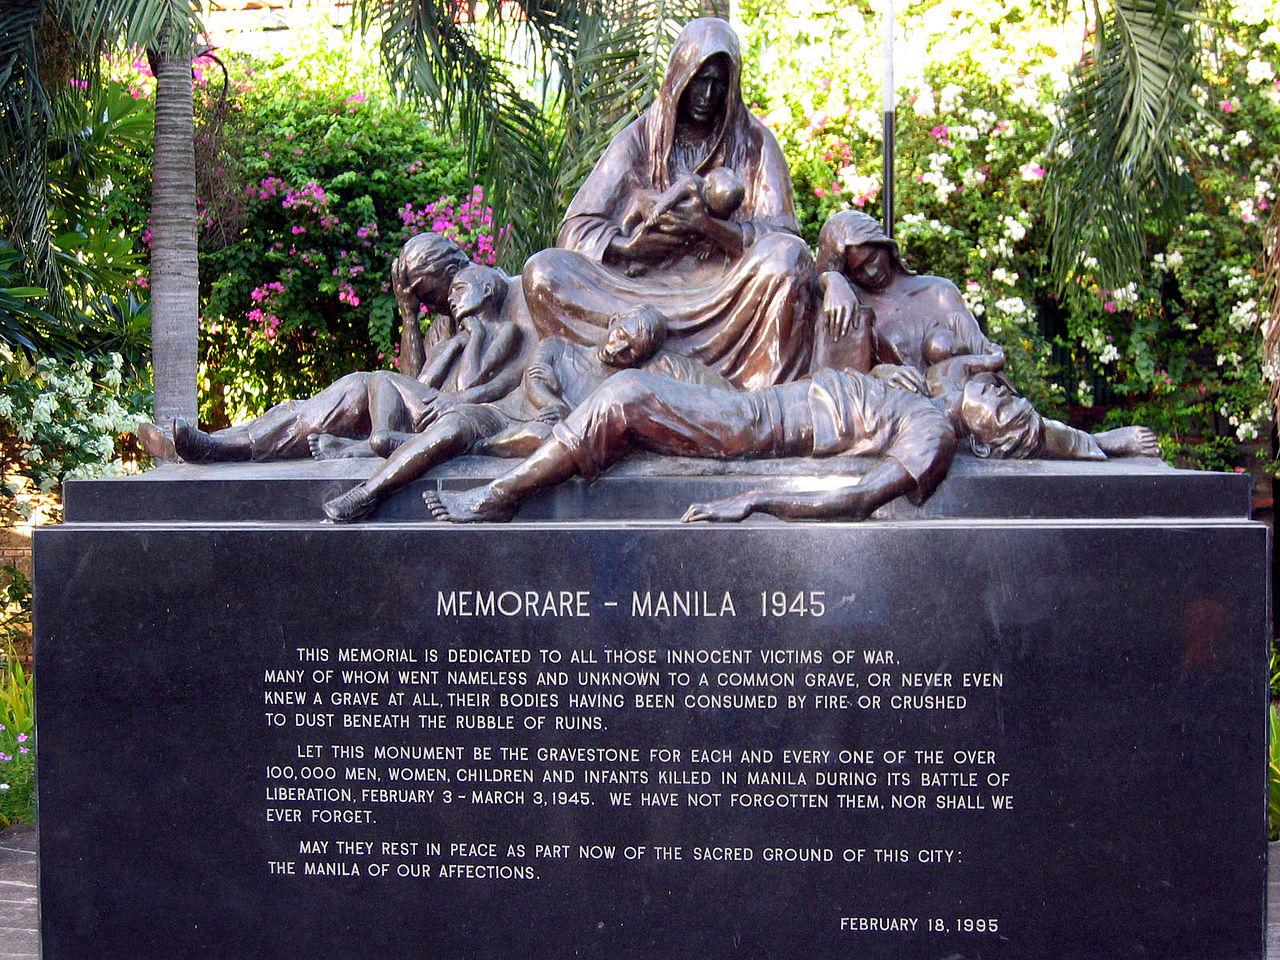 Memorare Manila 1945 (Source: Wikimedia.Commons)